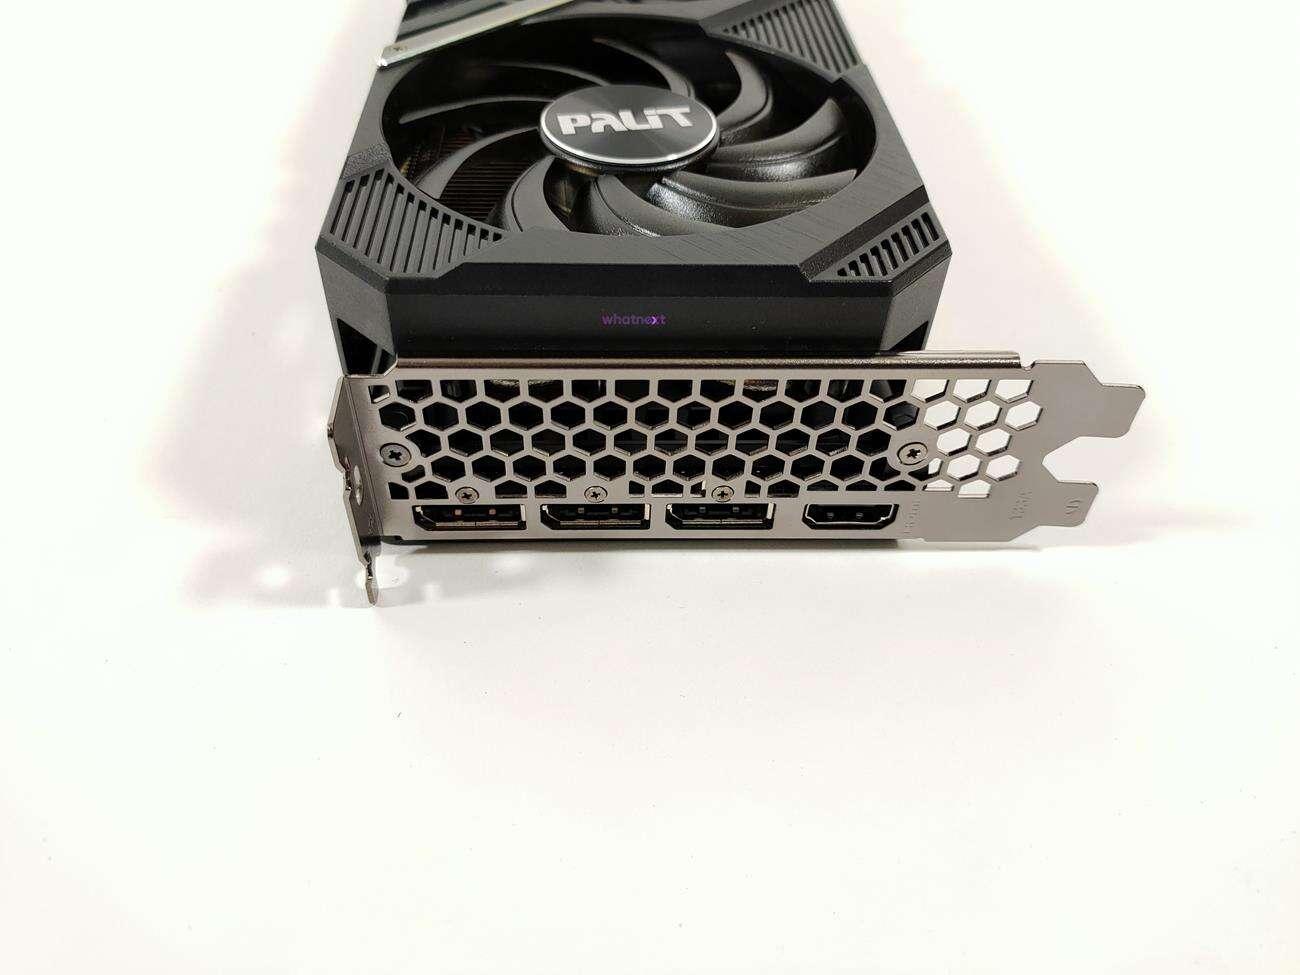 test Palit GeForce RTX 3070 GamingPro OC, recenzja Palit GeForce RTX 3070 GamingPro OC, review Palit GeForce RTX 3070 GamingPro OC, opinia Palit GeForce RTX 3070 GamingPro OC